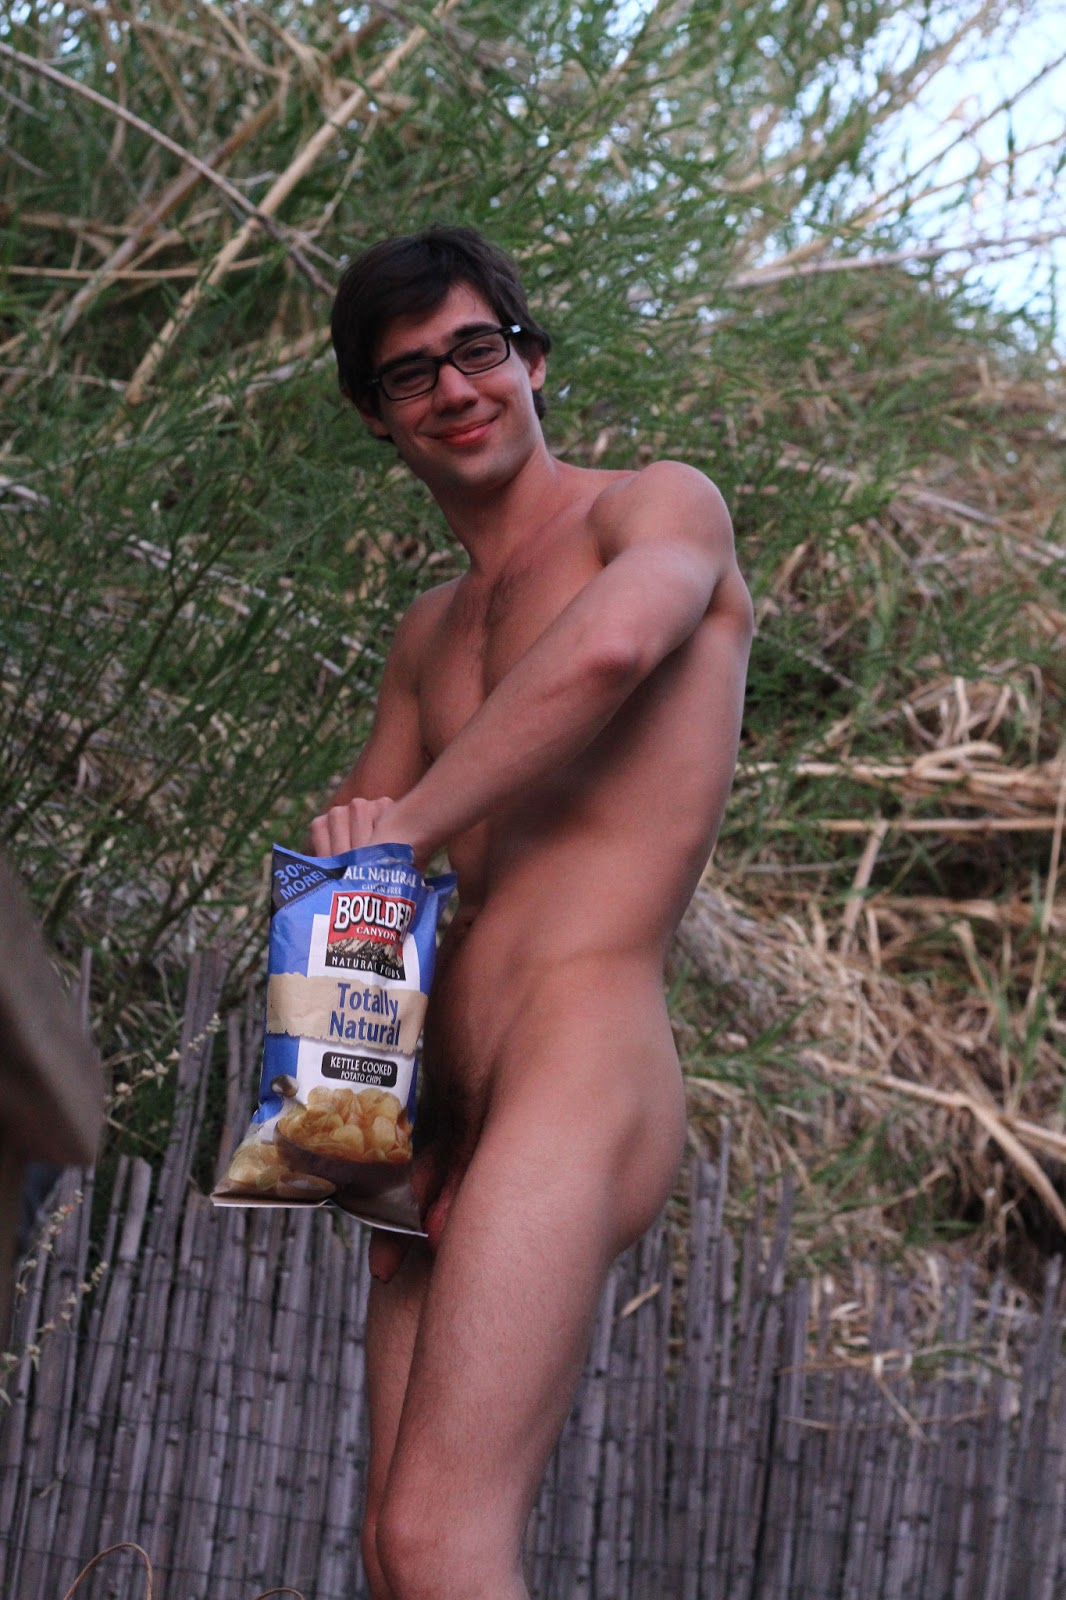 Xxxpornoh erotic pictures